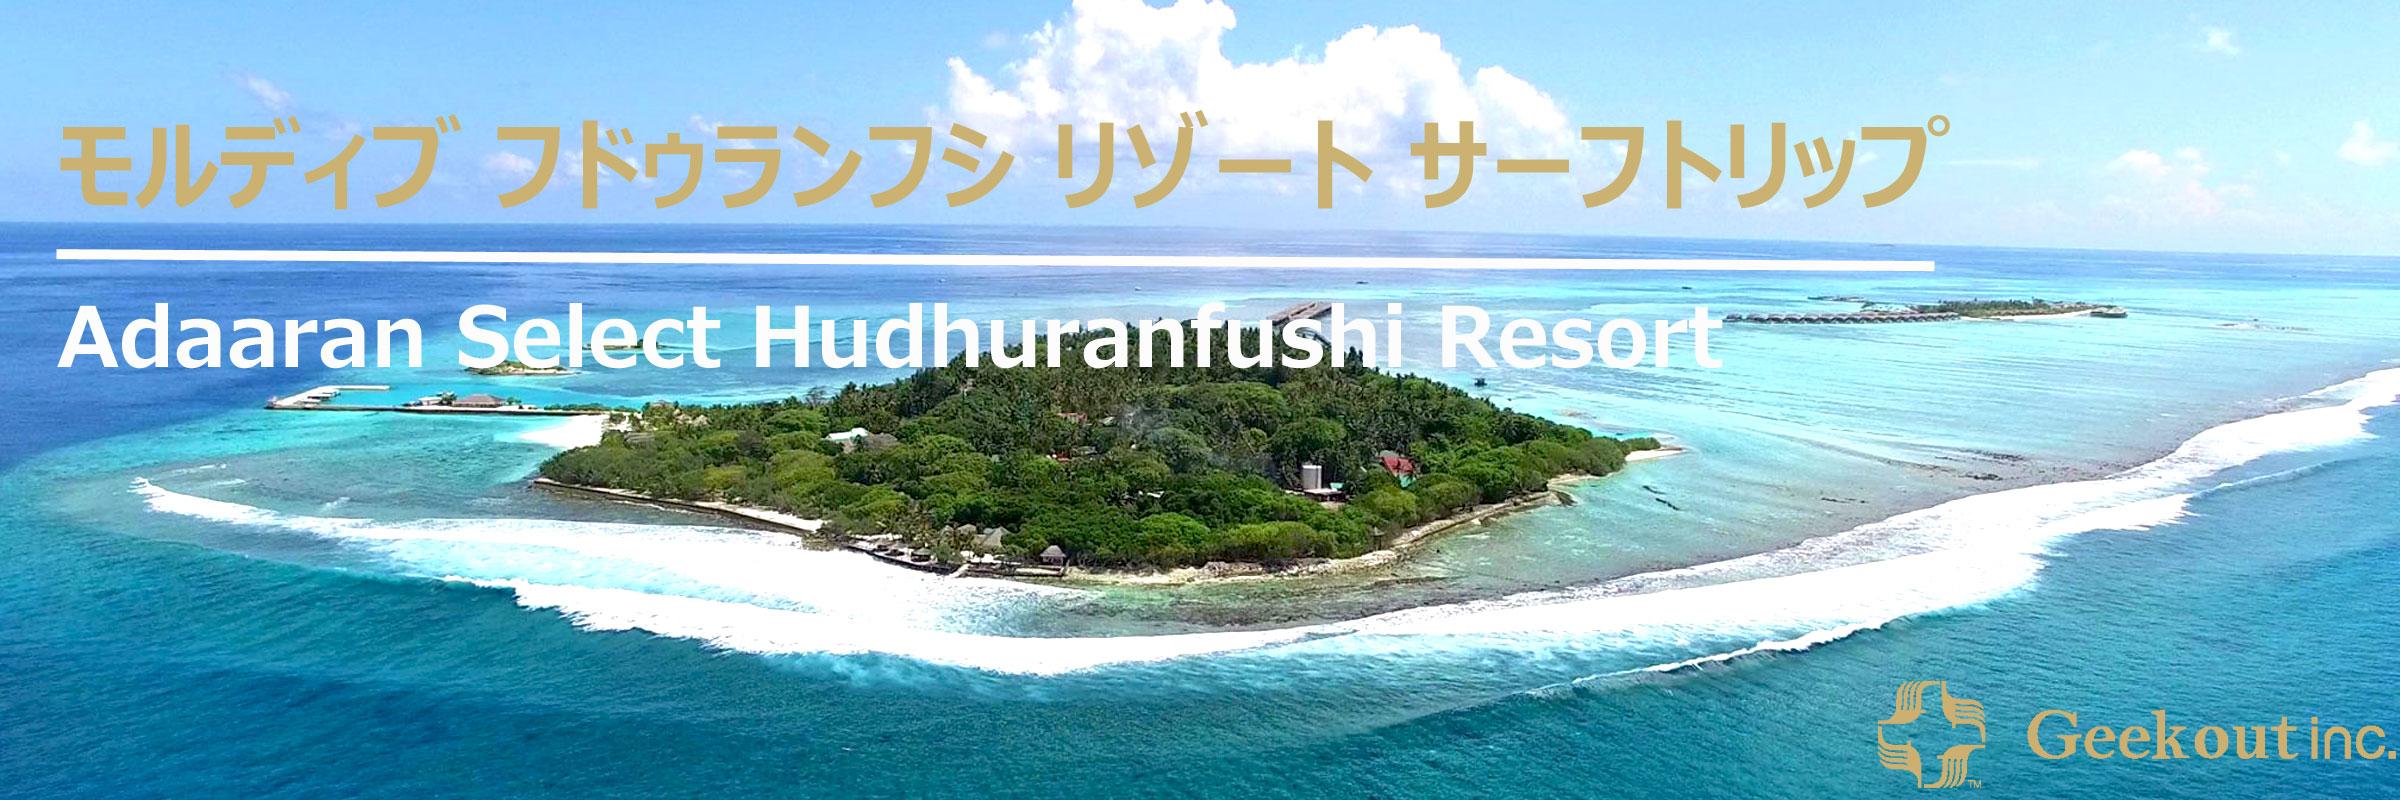 Banner Maldives